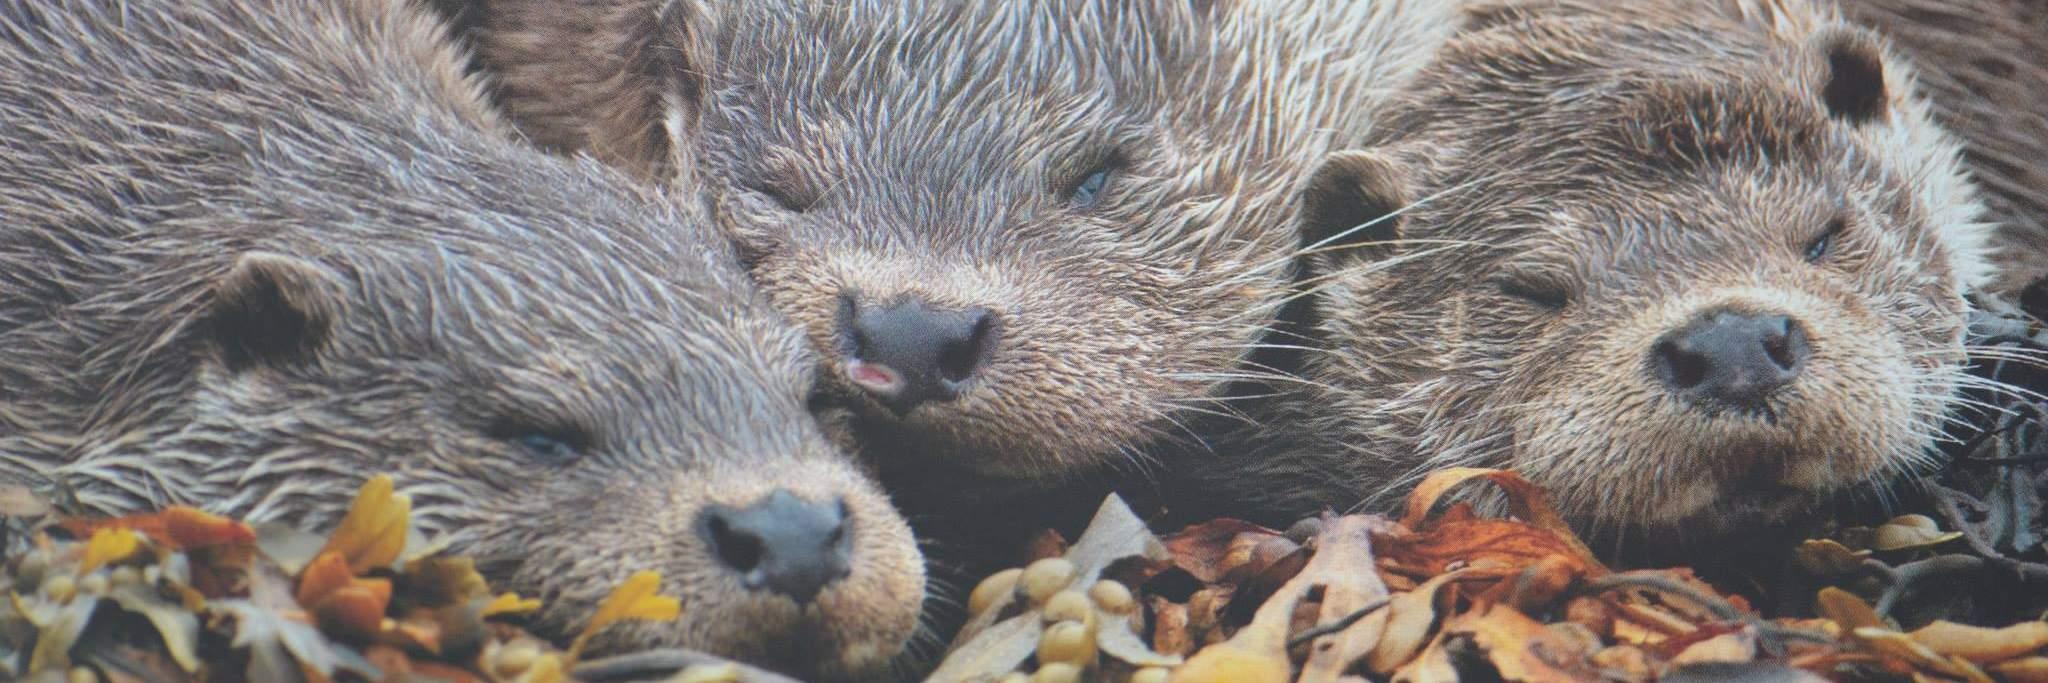 Wildlife in Perthshire